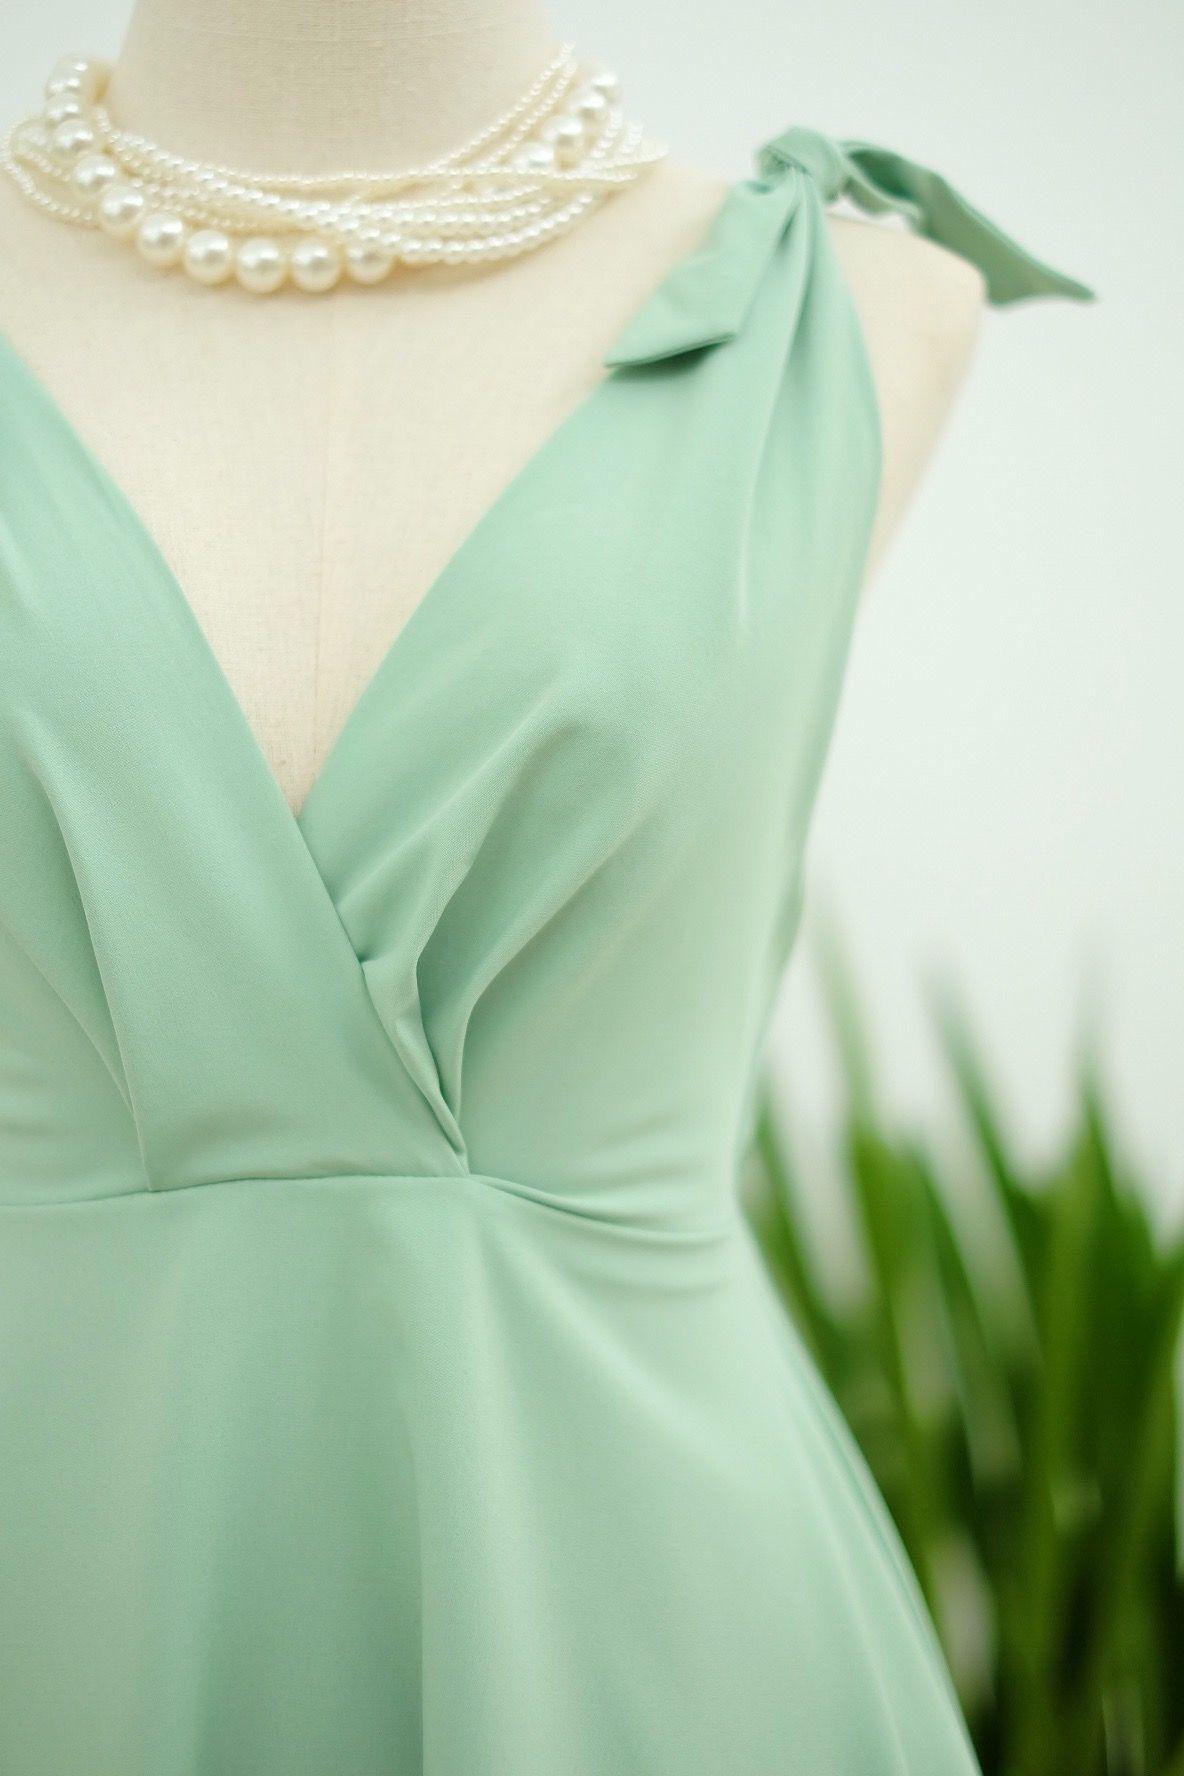 Green dress for wedding party  Sundress By Keeratika B  Keeratika B Dress on Etsy  Pinterest